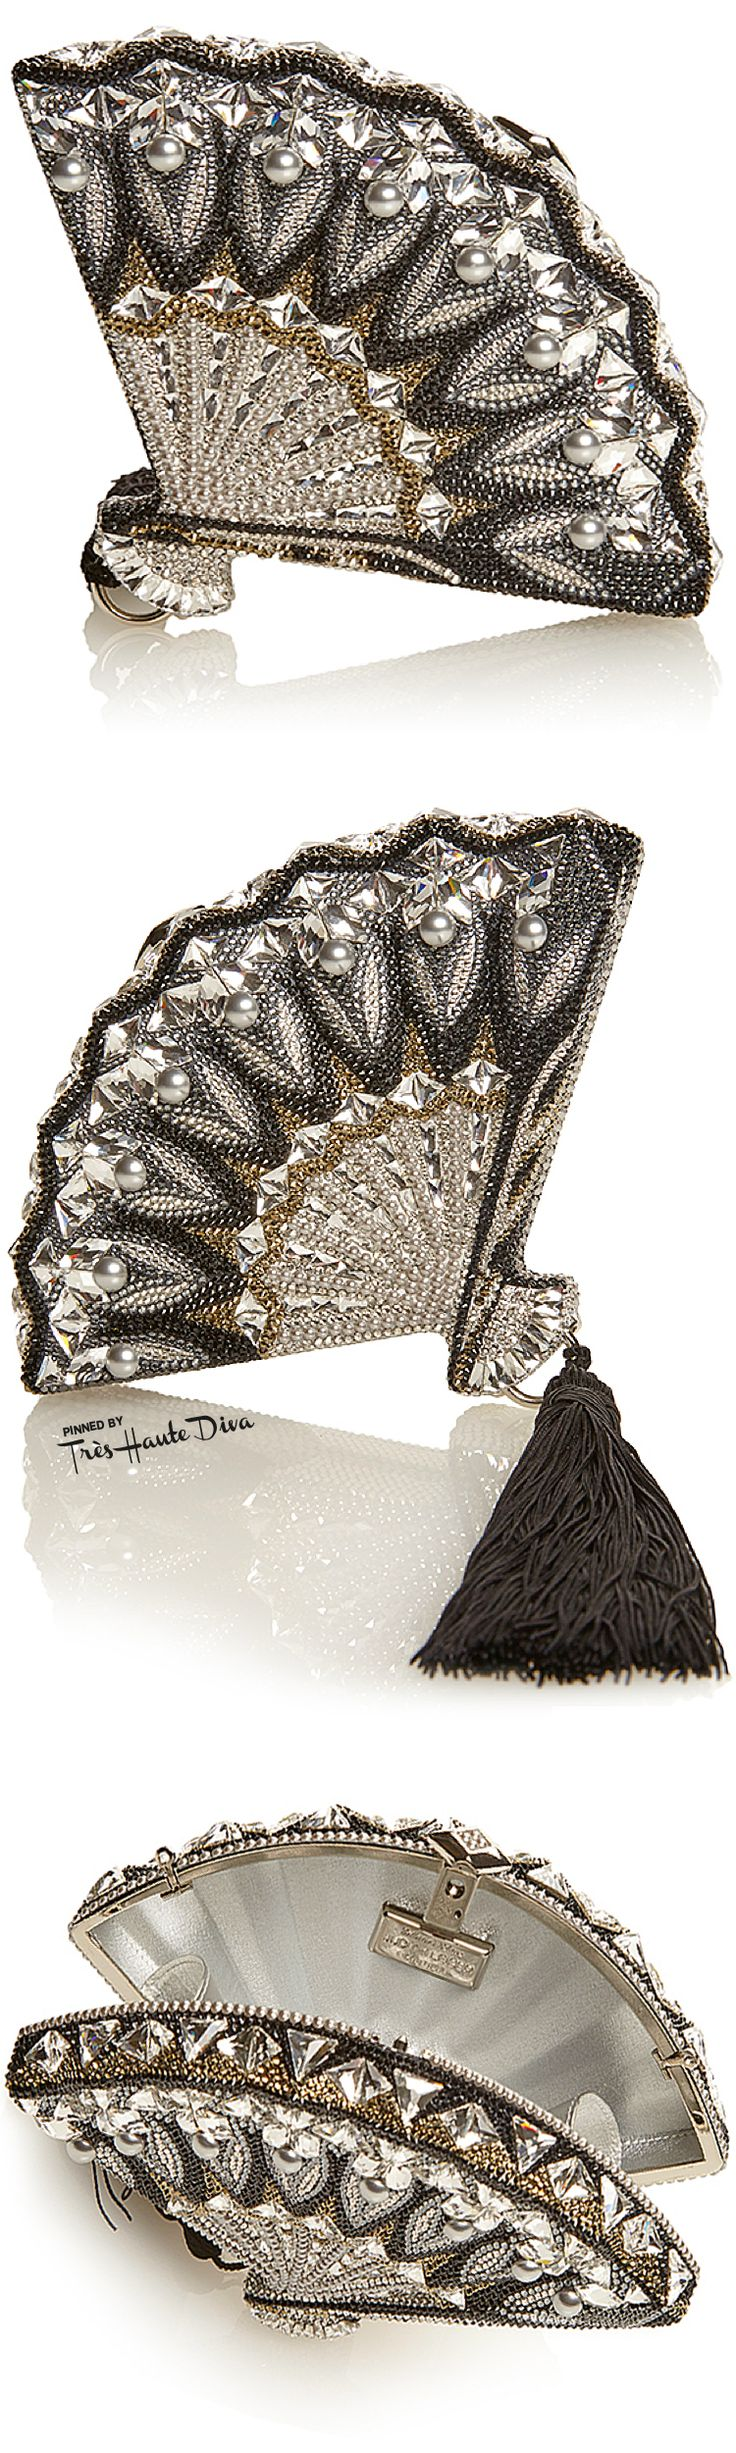 Judith Leiber Fall 2015 Collection ♔ Fan Interlude Clutch— Très Haute Diva